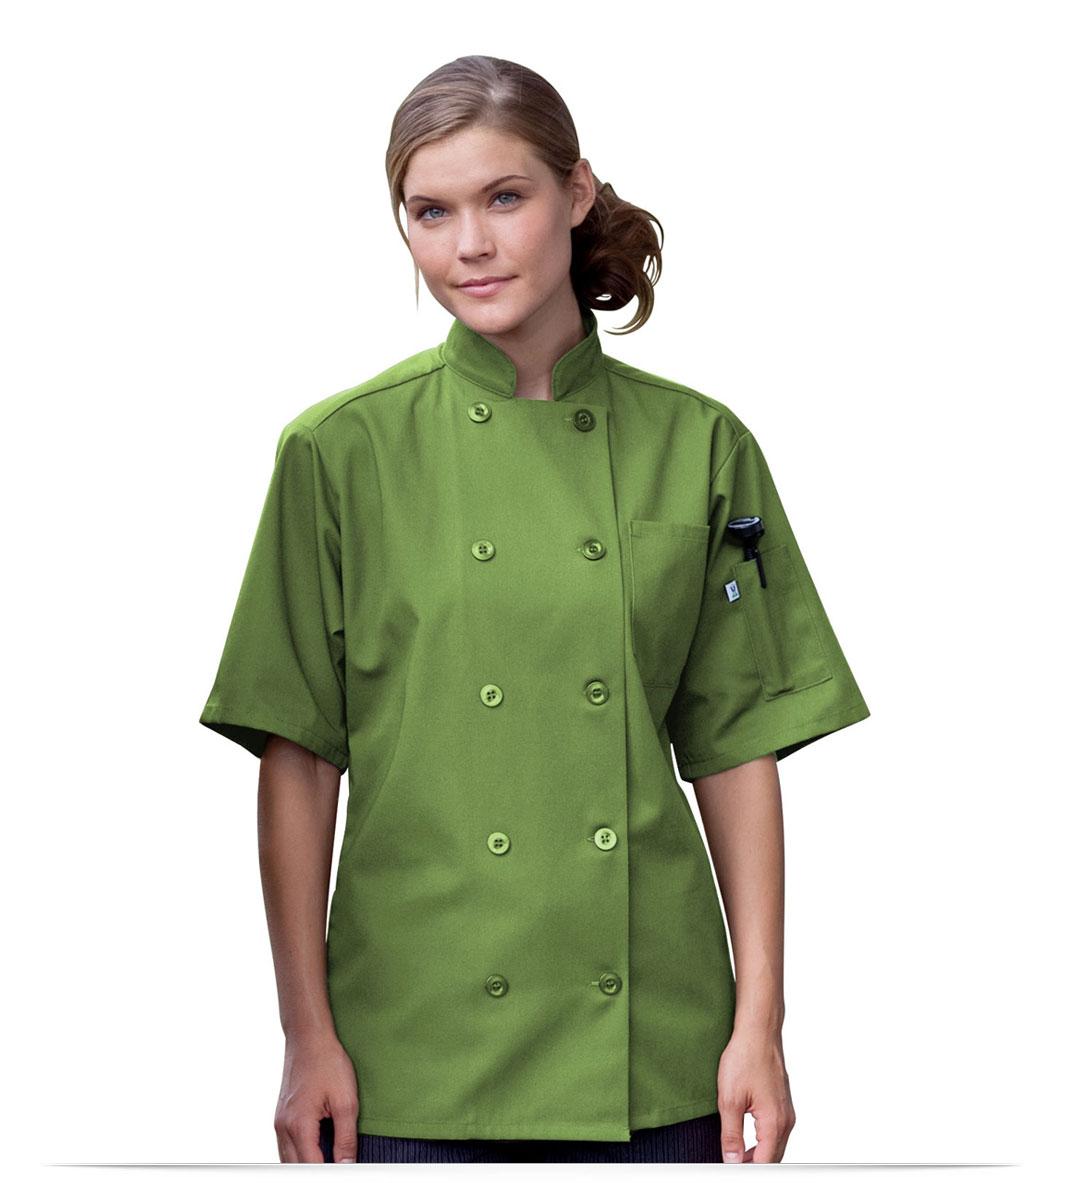 Personalized Logo 10 Button Short-Sleeve Chef Jacket